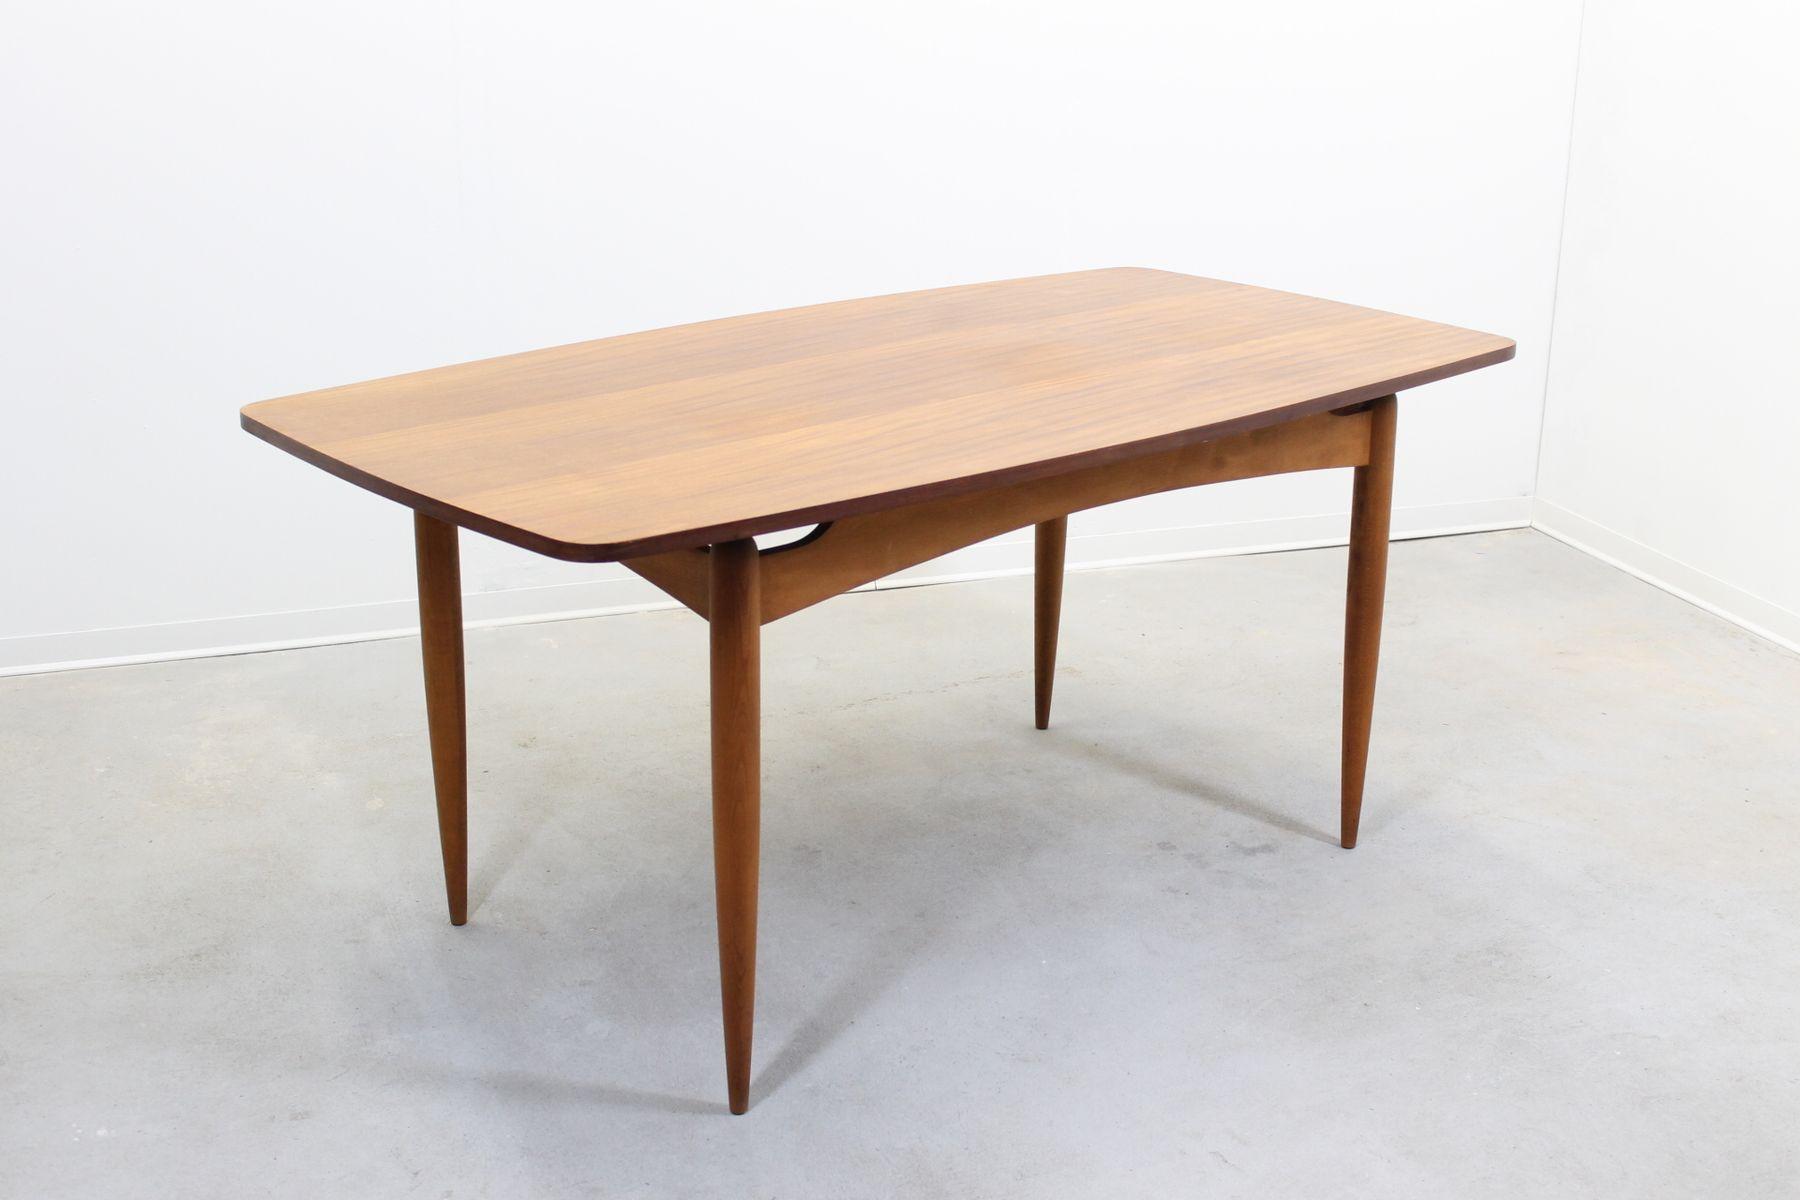 Danish Midcentury Teak Veneer Dining Table for sale at Pamono : danish midcentury teak veneer dining table 1 from www.pamono.com size 1800 x 1200 jpeg 83kB